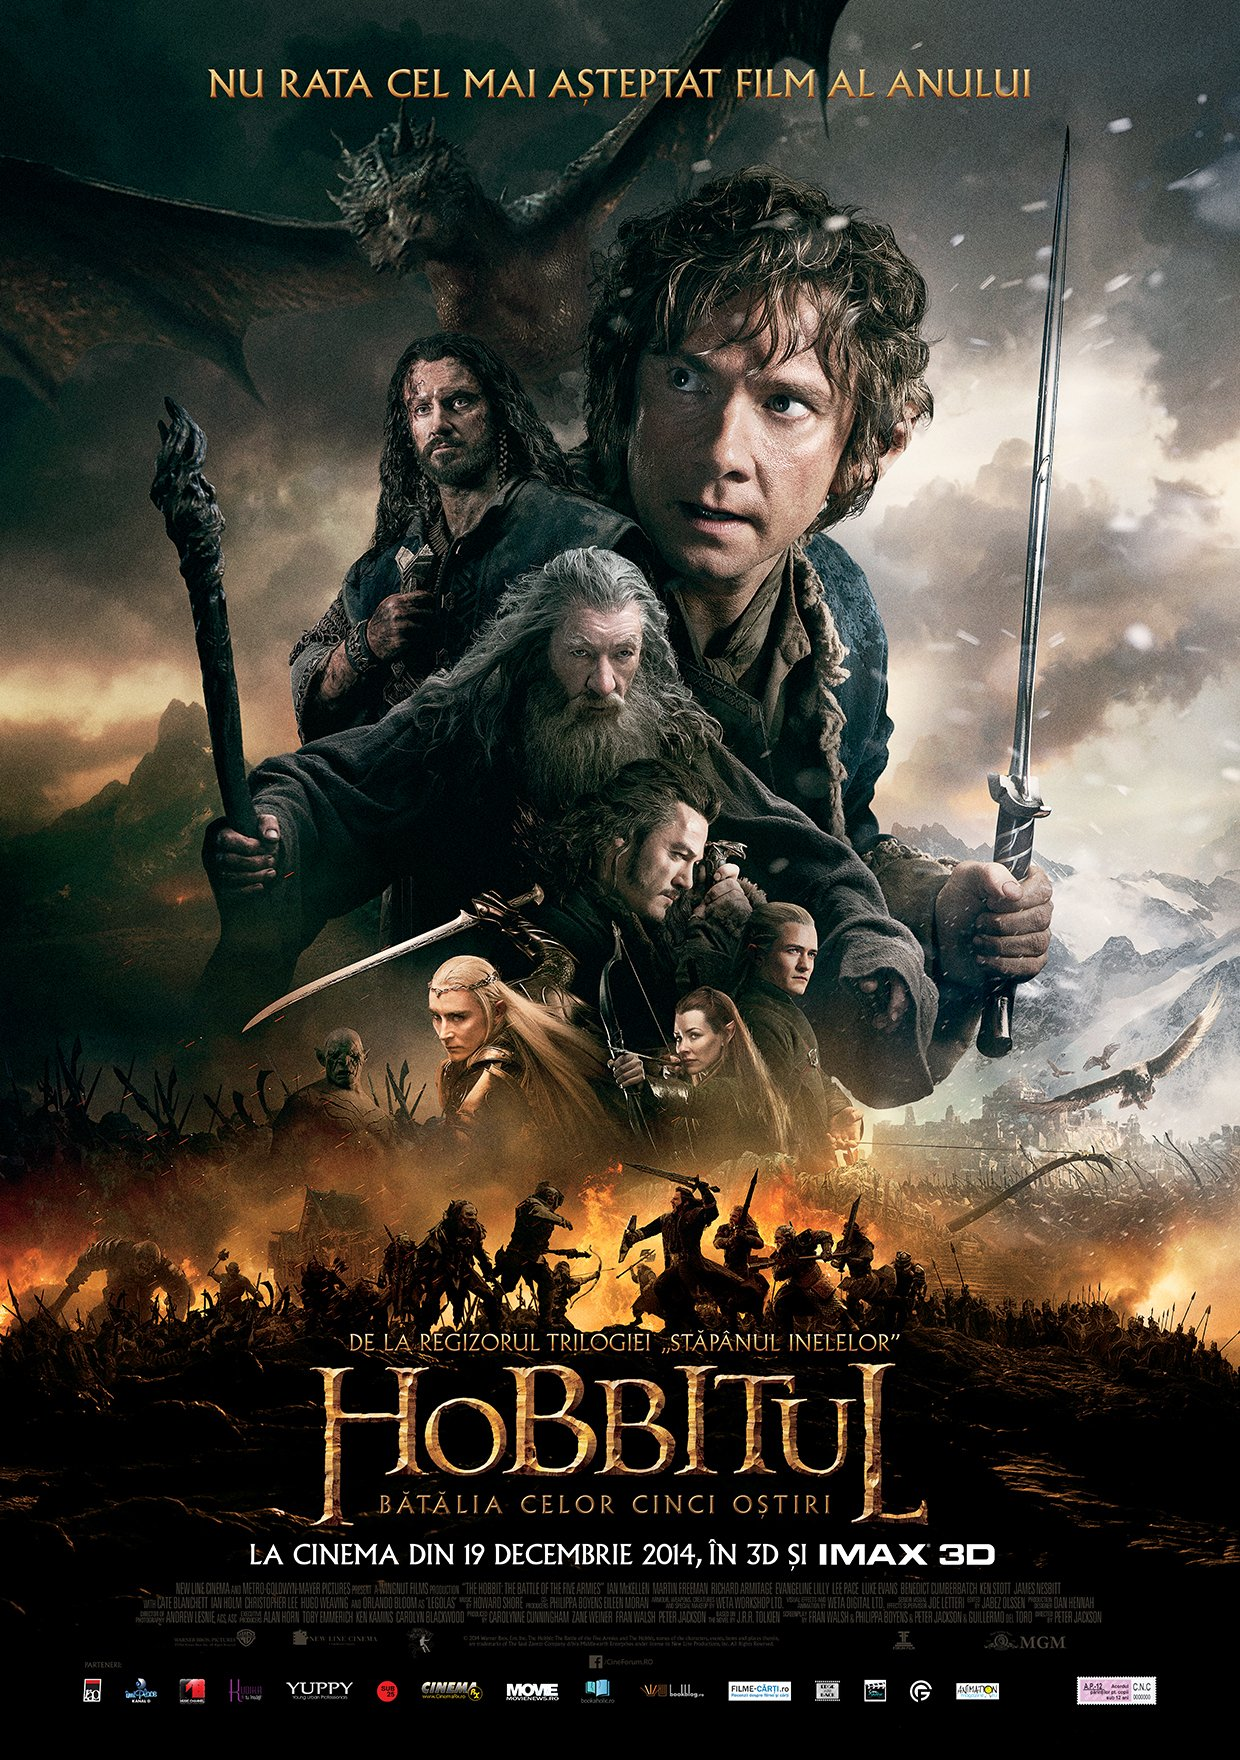 Hobbitul Batalia celor Cinci Ostiri